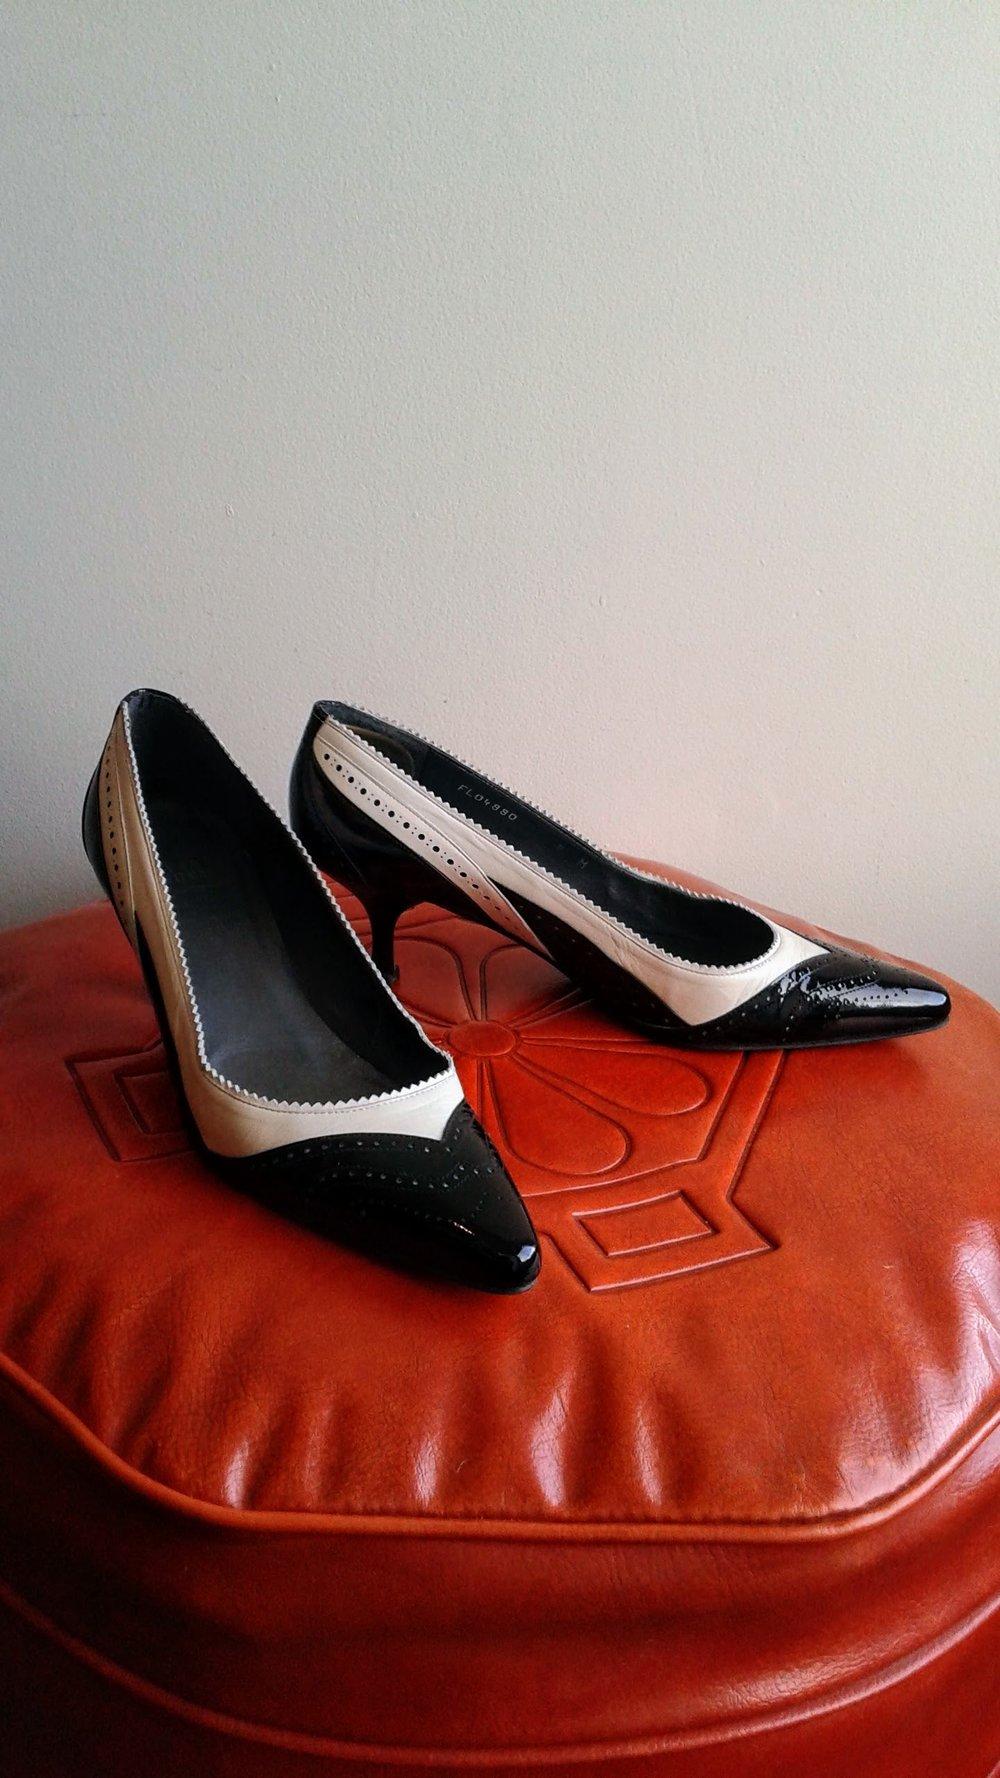 Stuart Weitzman shoes; S8, $62